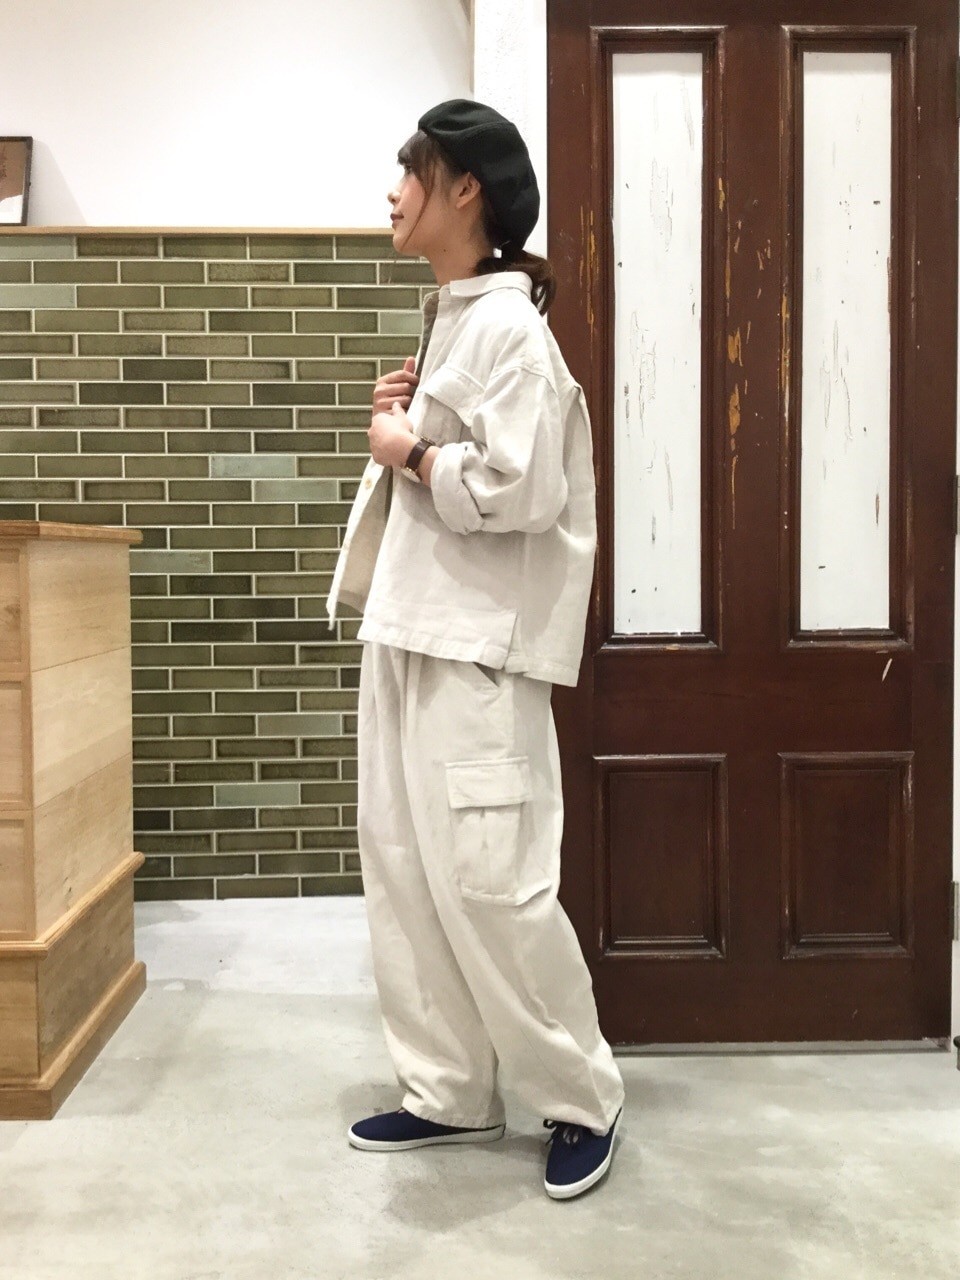 chambre de charme 横浜ジョイナス 身長:162cm 2020.08.31